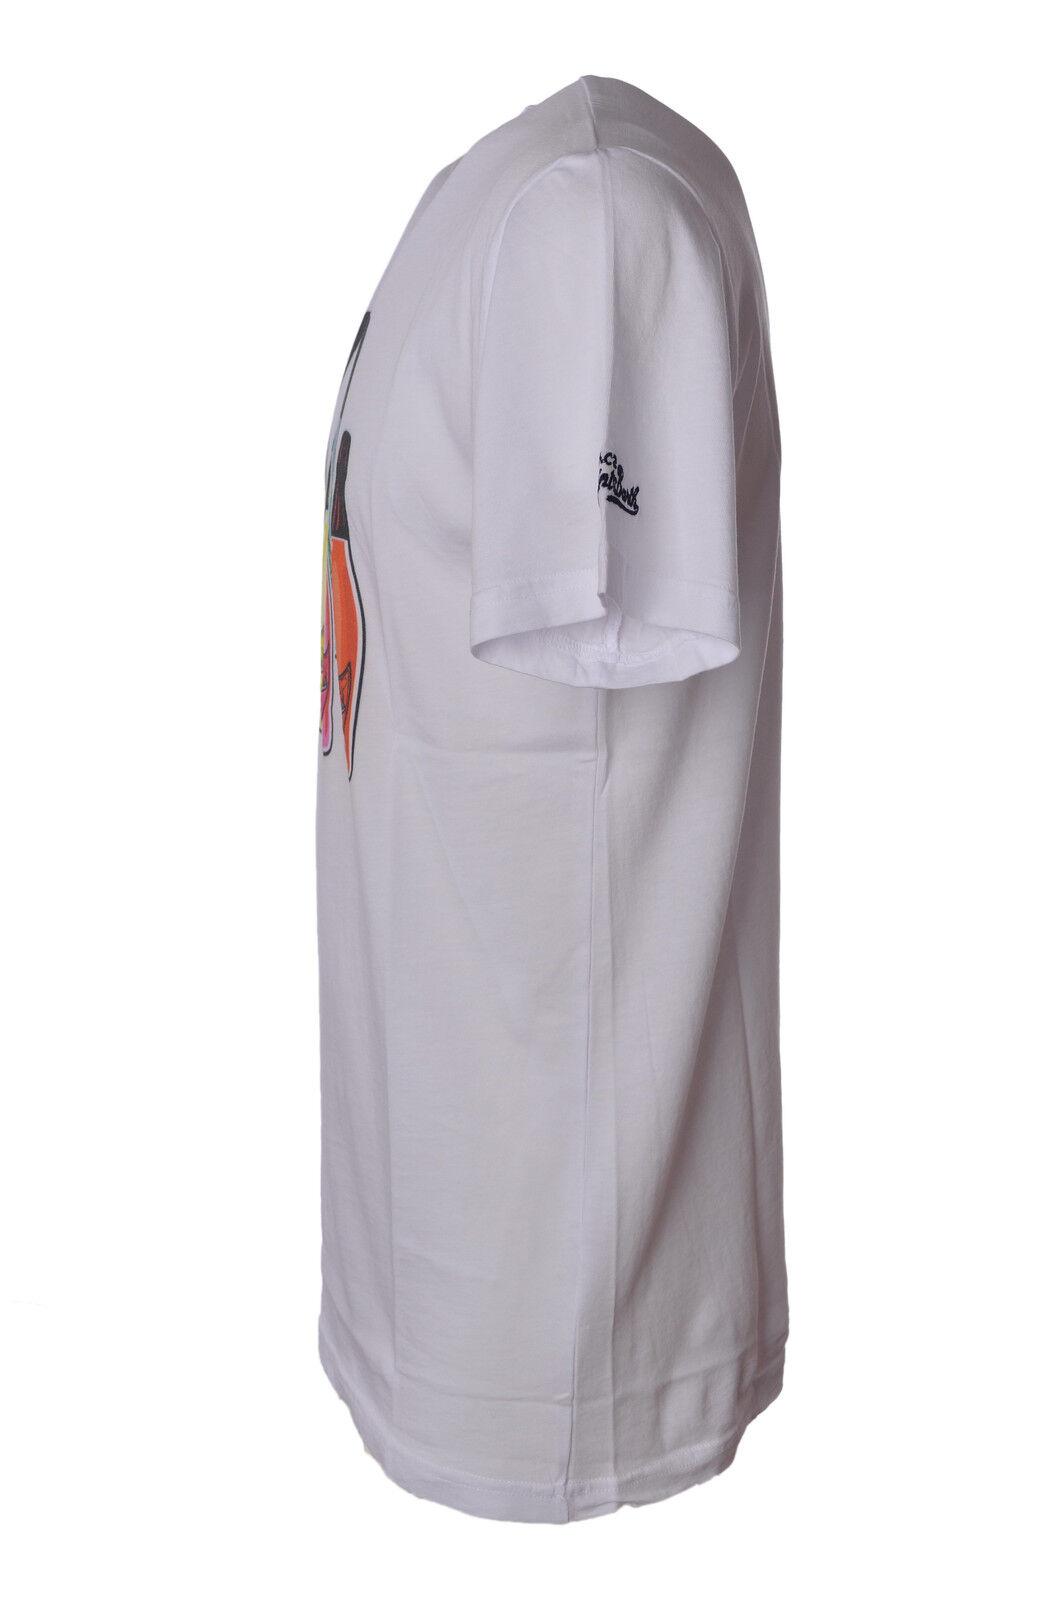 Saint Barth  - -  T - - Male - bianca - 3377220A181527 d4da6d